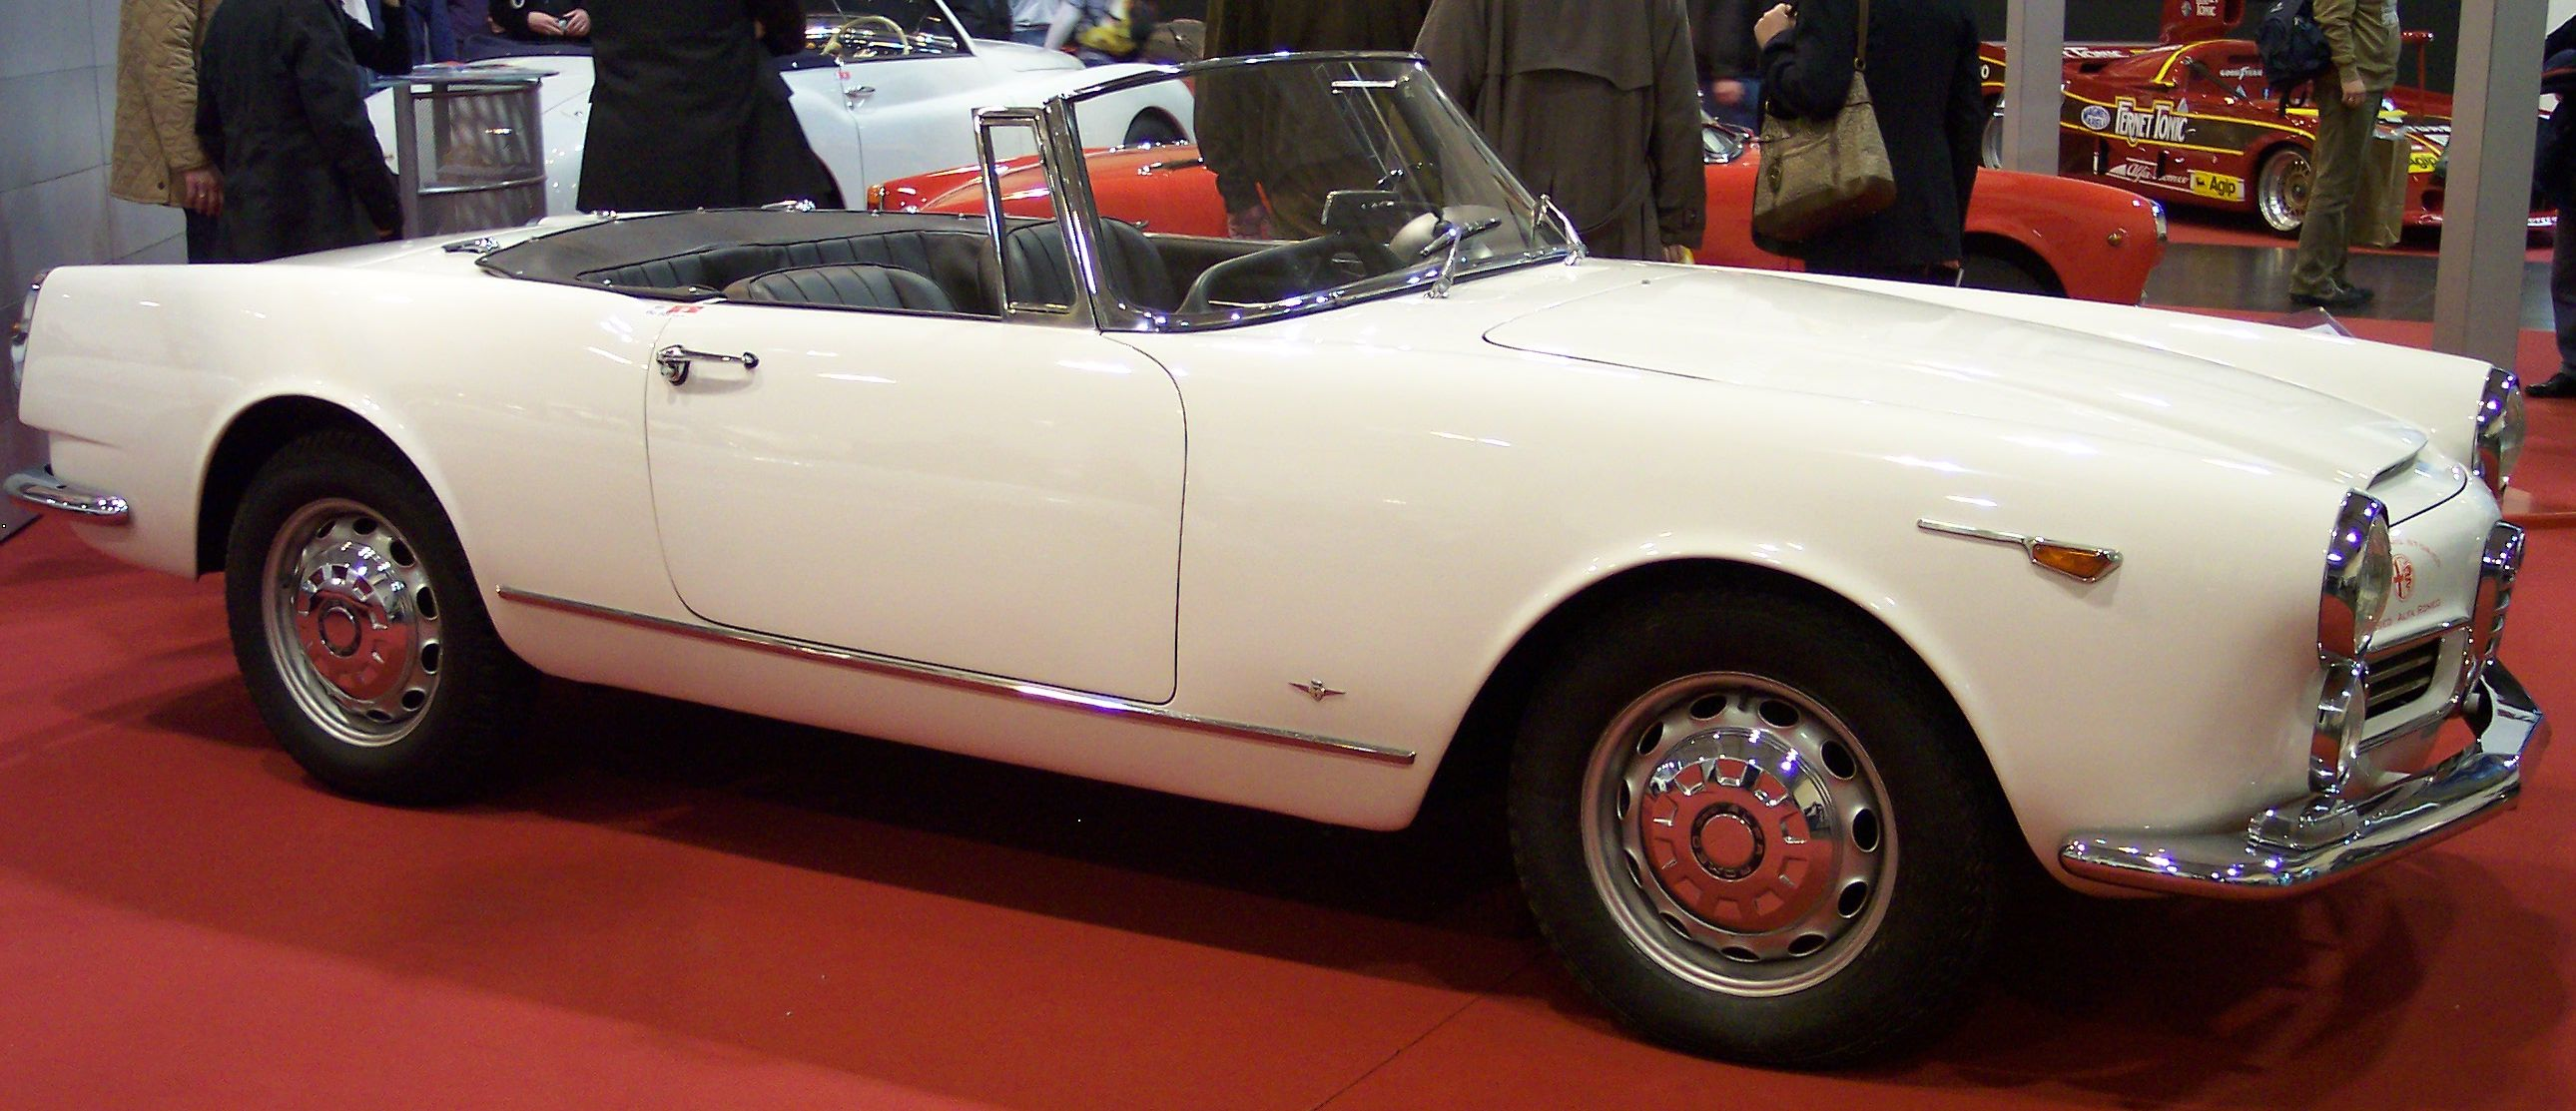 file:alfa romeo 2600 spider 1962 white vr tce - wikimedia commons